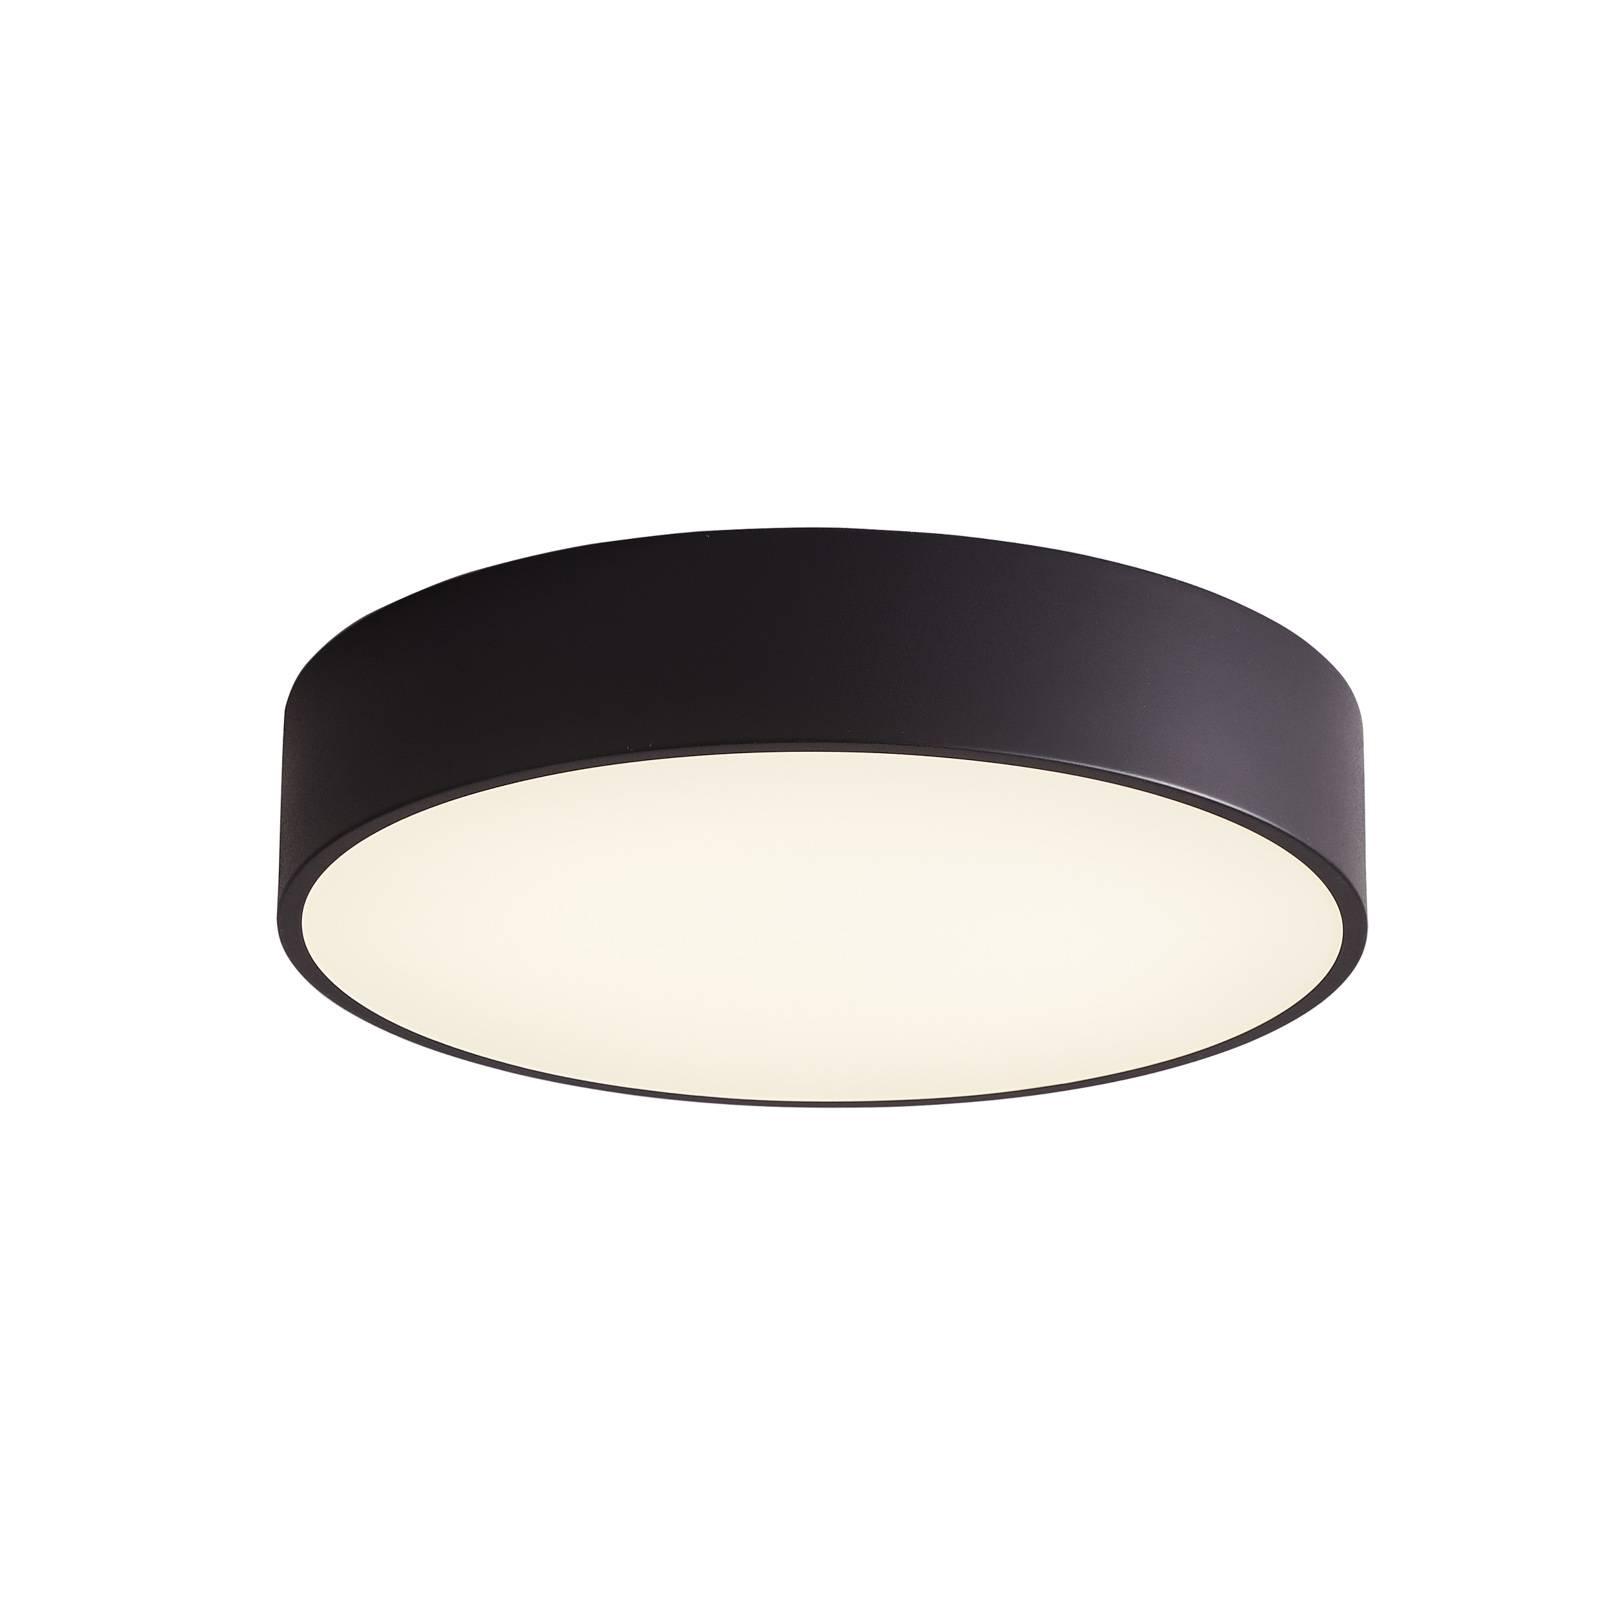 Arcchio Noabelle -LED-kattovalaisin, musta, 80 cm